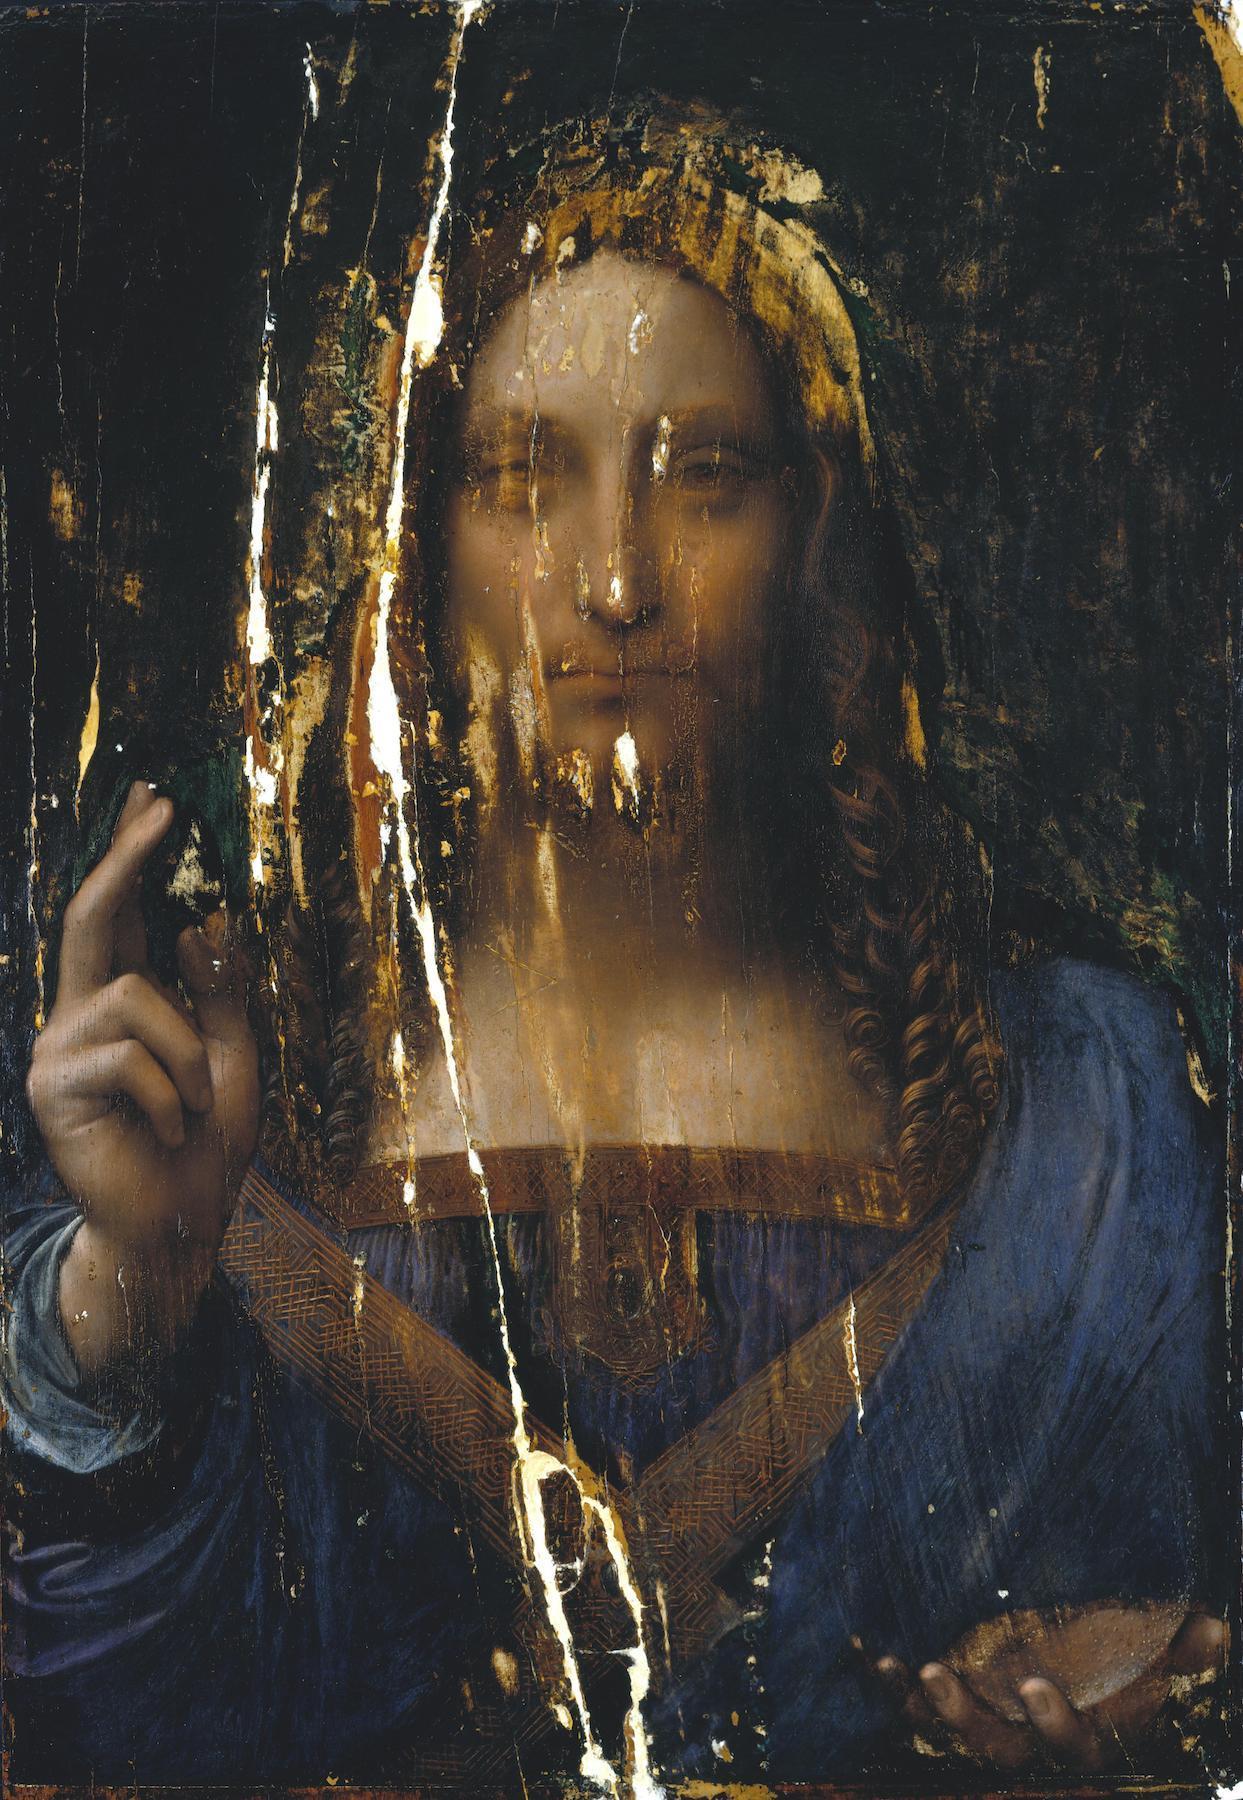 Leonardo da Vinci Salvator Mundi (ca. 1500) after cleaning